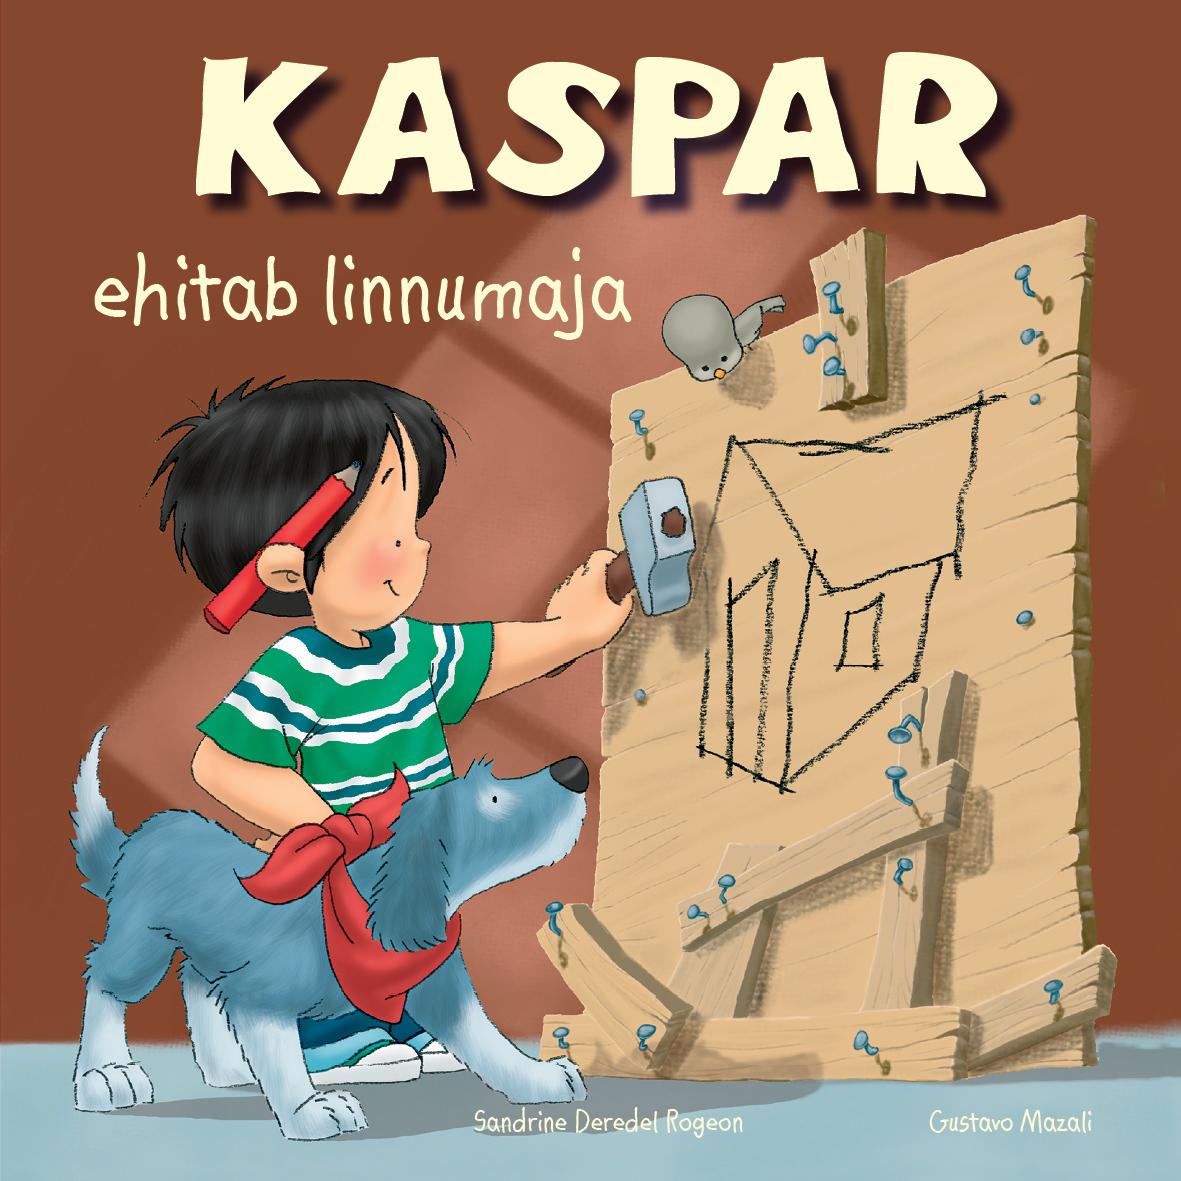 лучшая цена Gustavo Mazali Kaspar ehitab linnumaja